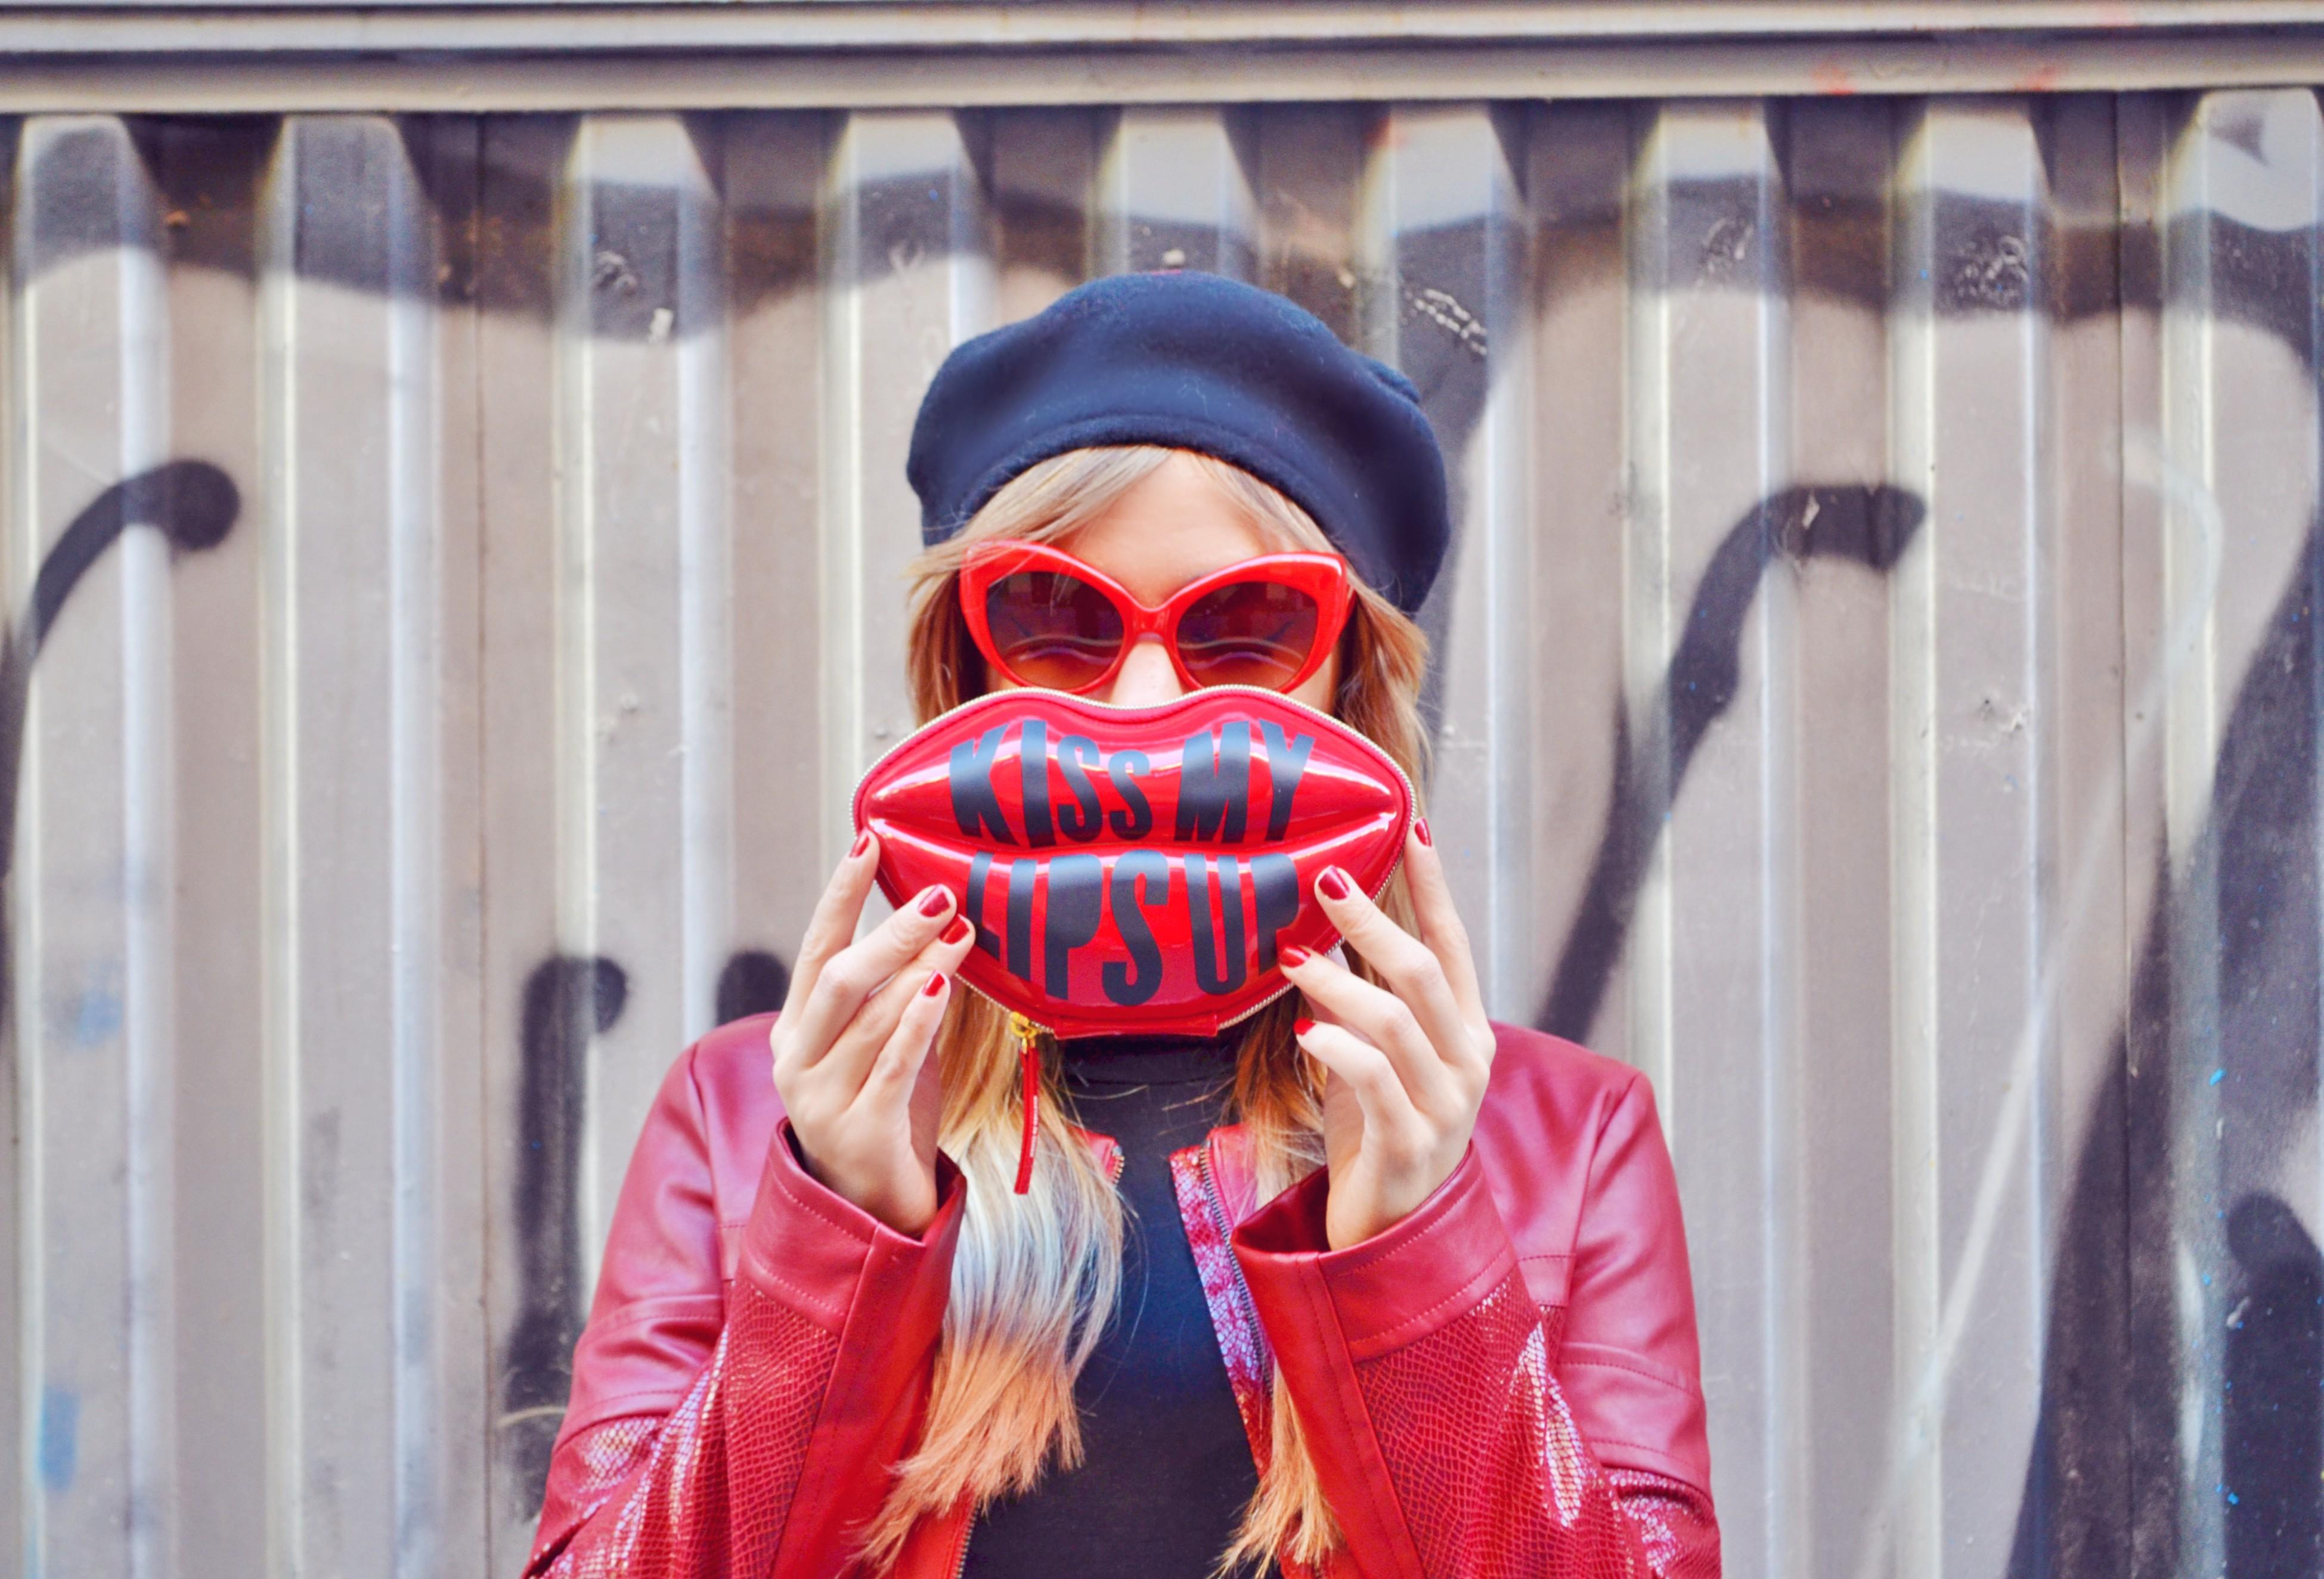 Chaqueta roja piensa en chic - The body shop madrid ...